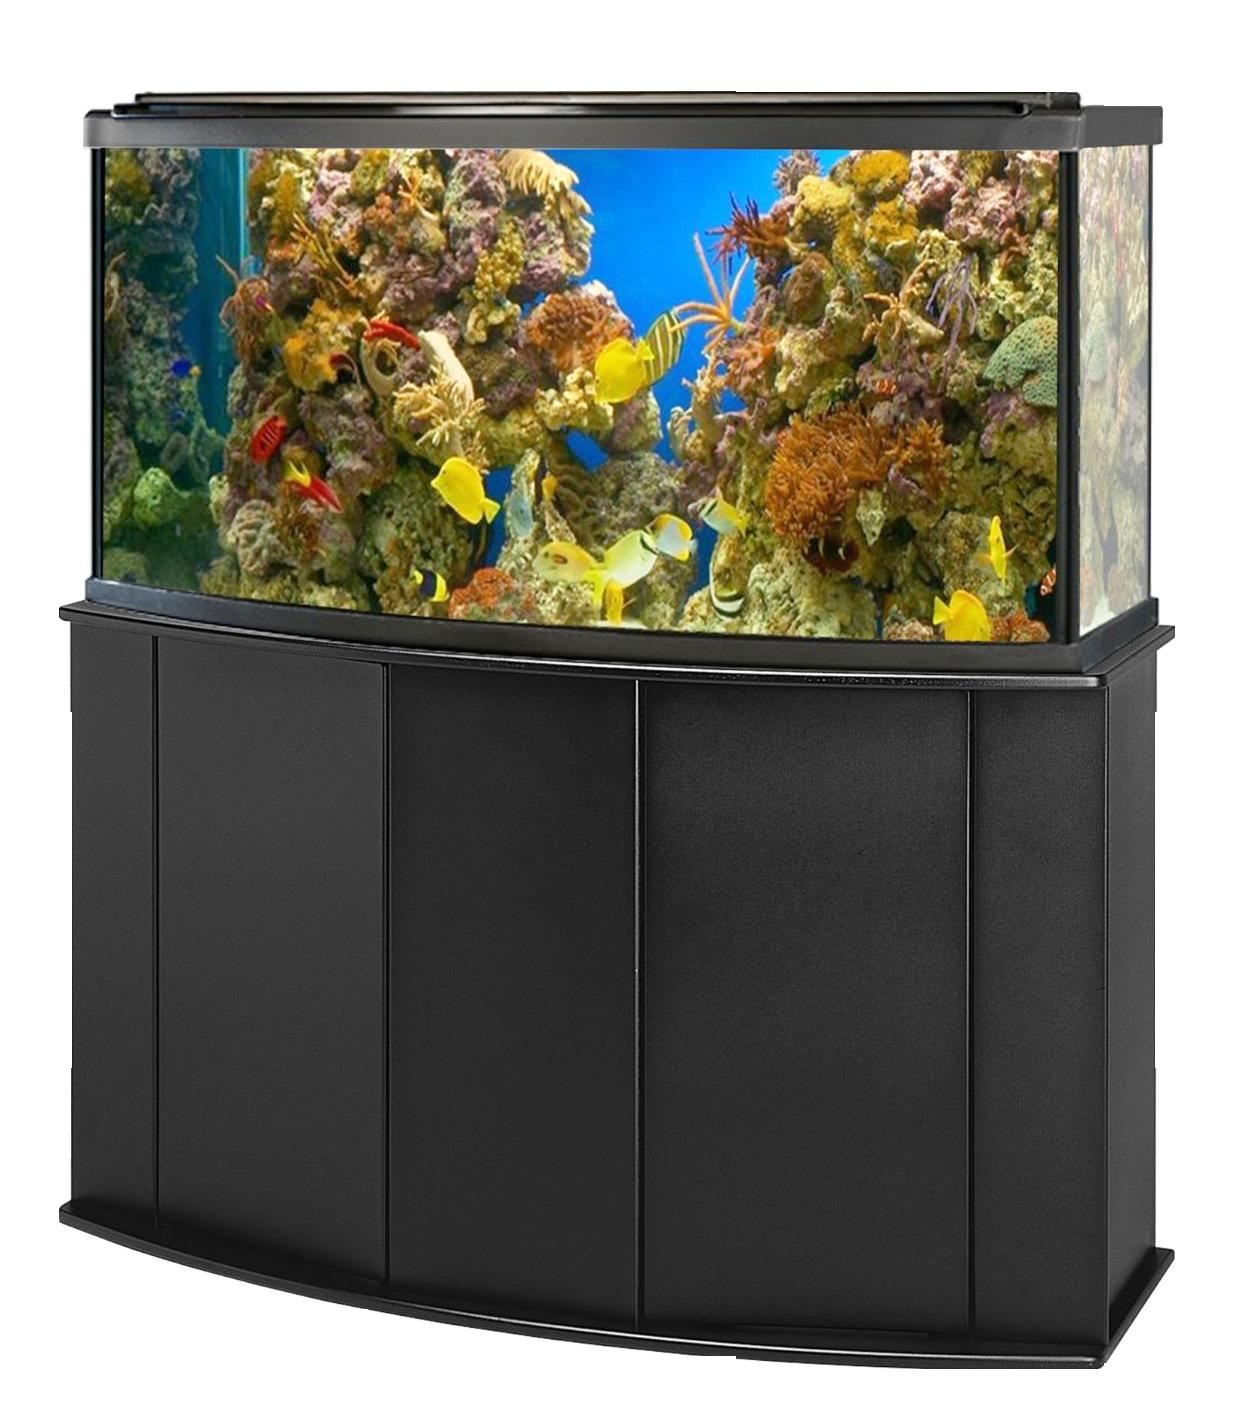 Aquarium Fish Tank Png Image Purepng Free Transparent Cc0 Png